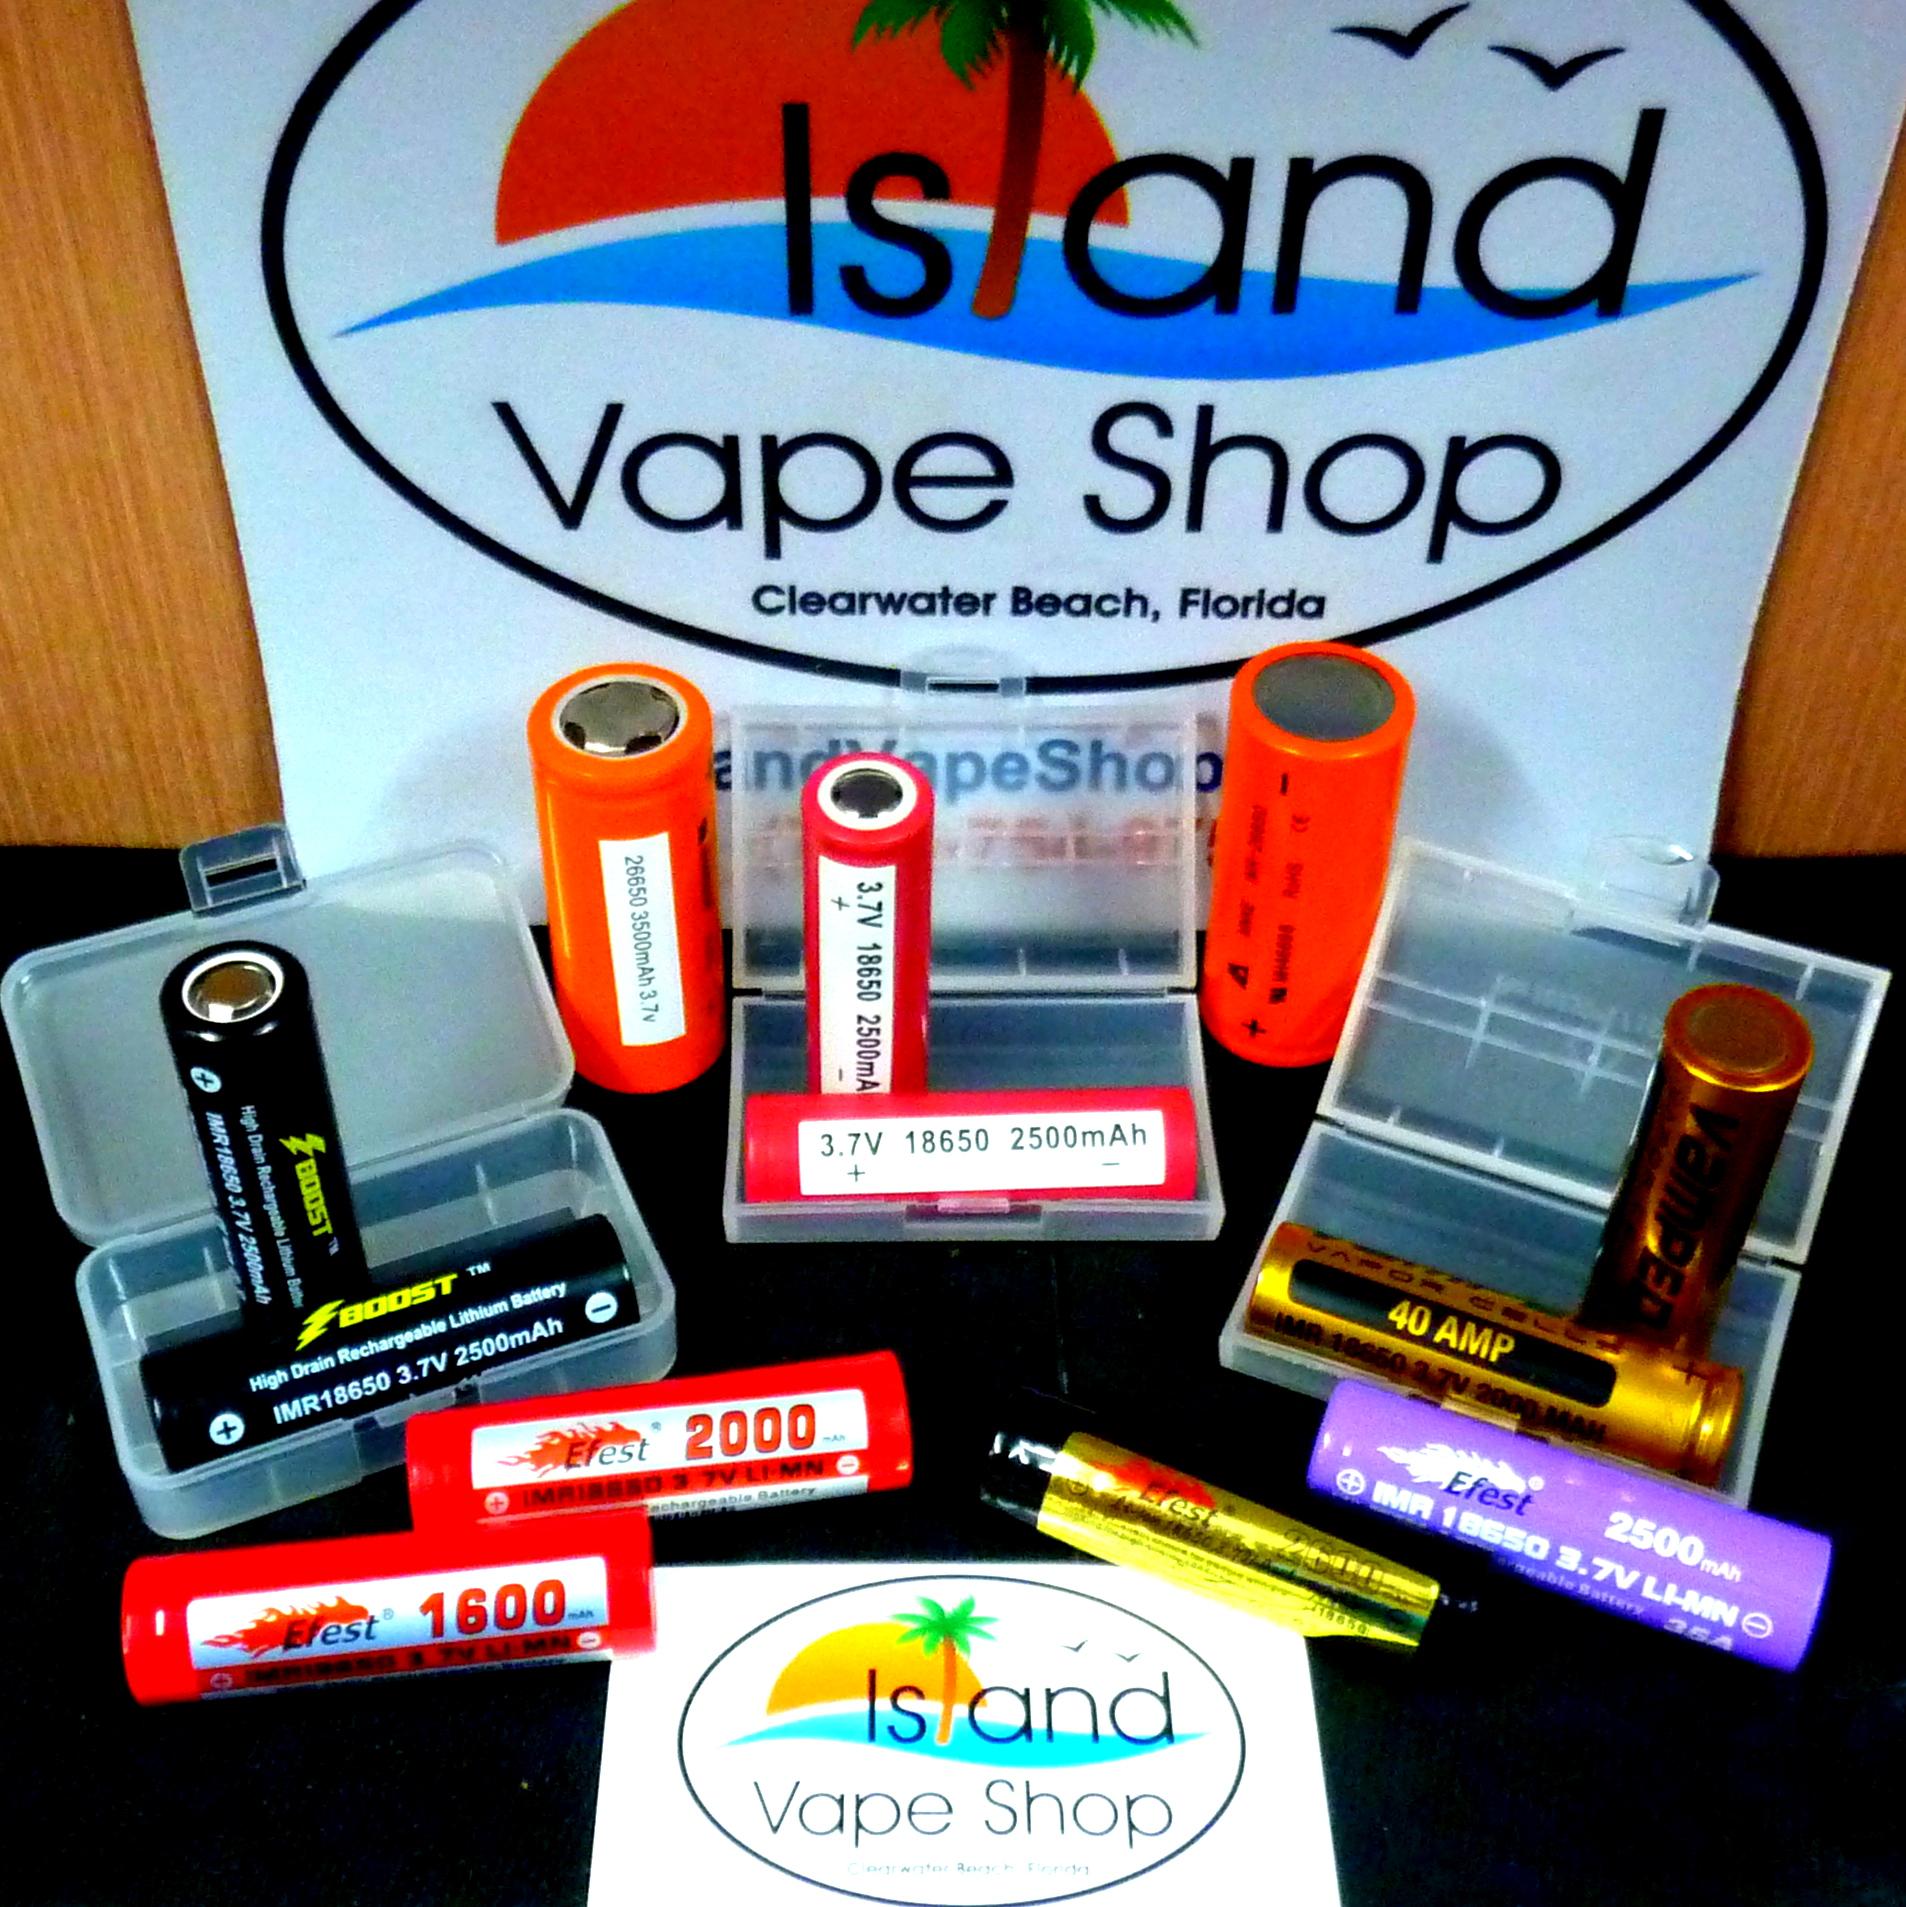 island_vape_shop_efest_boost+vamped__35a_40A_20A_sony_battery_top-high-drain-batteries-sub-ohm-vaping.jpg